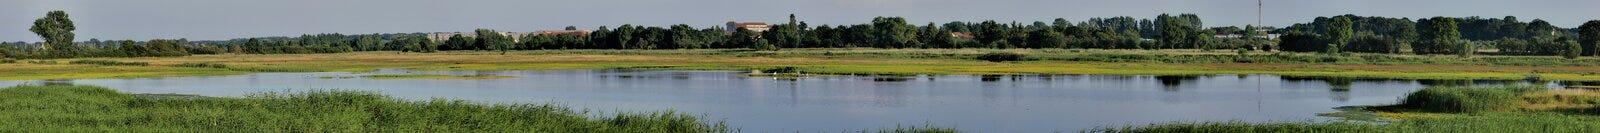 Wetland Panorama Royalty Free Stock Photos